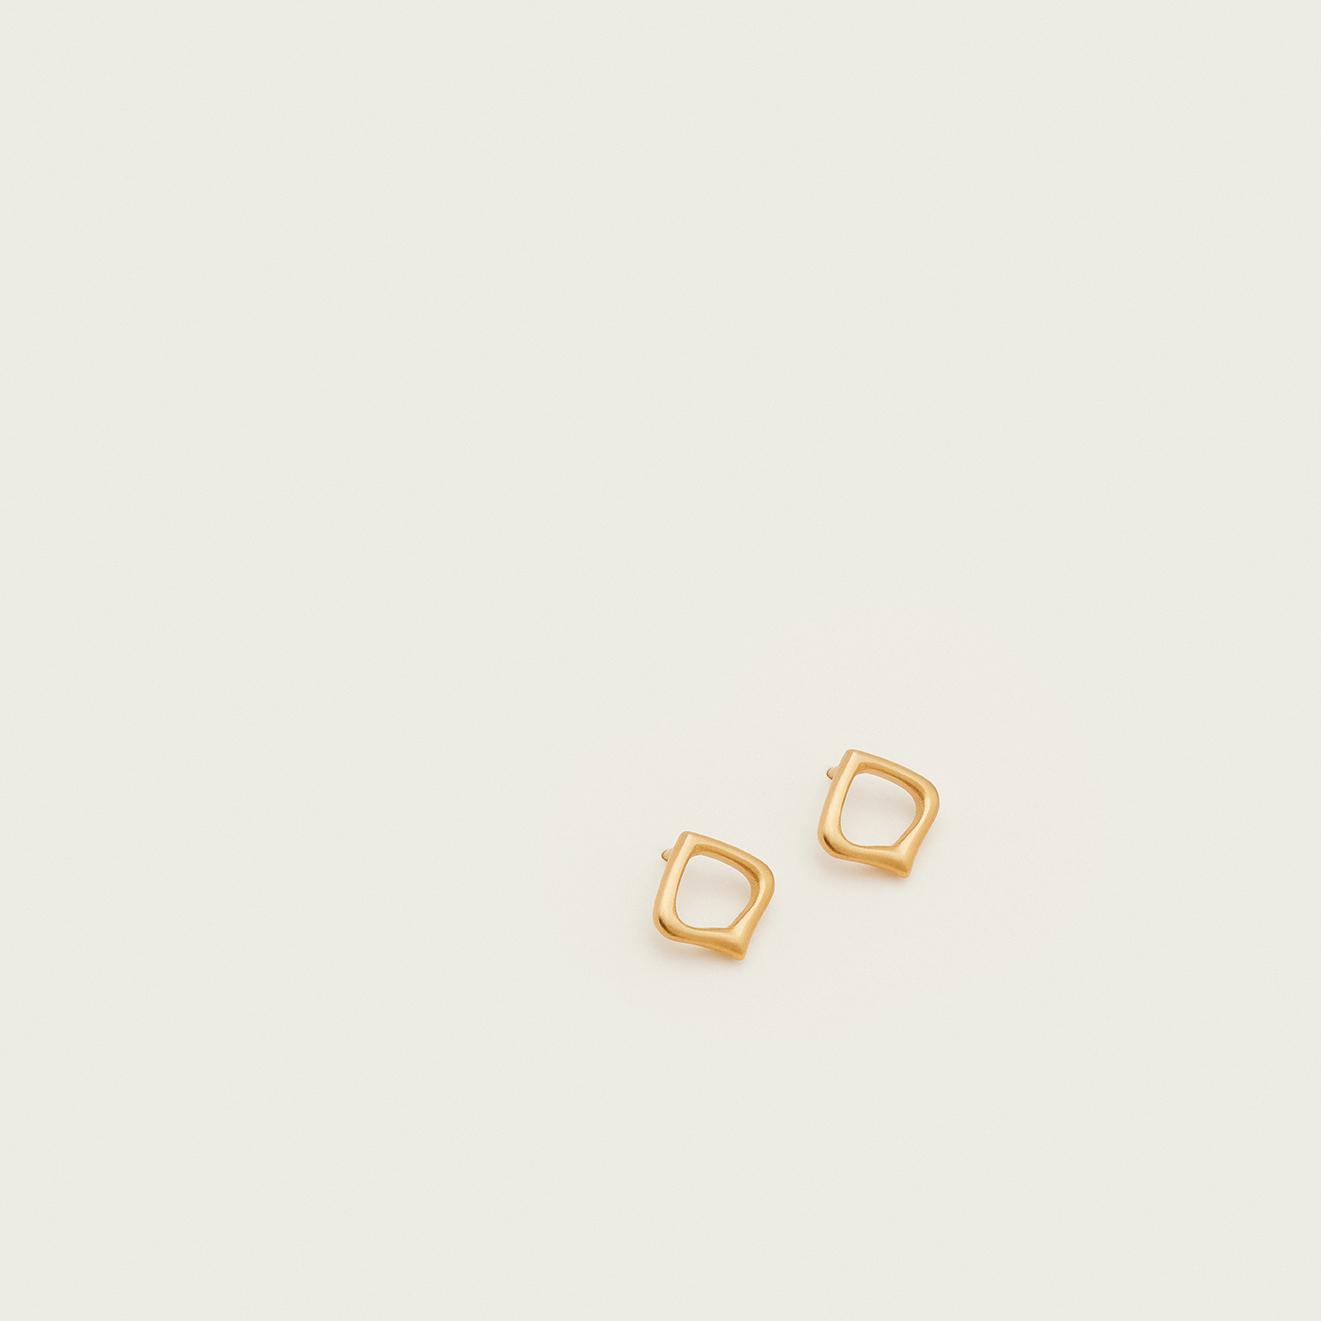 Moznabi Jewellery – Essence of Persia – Gold Studs